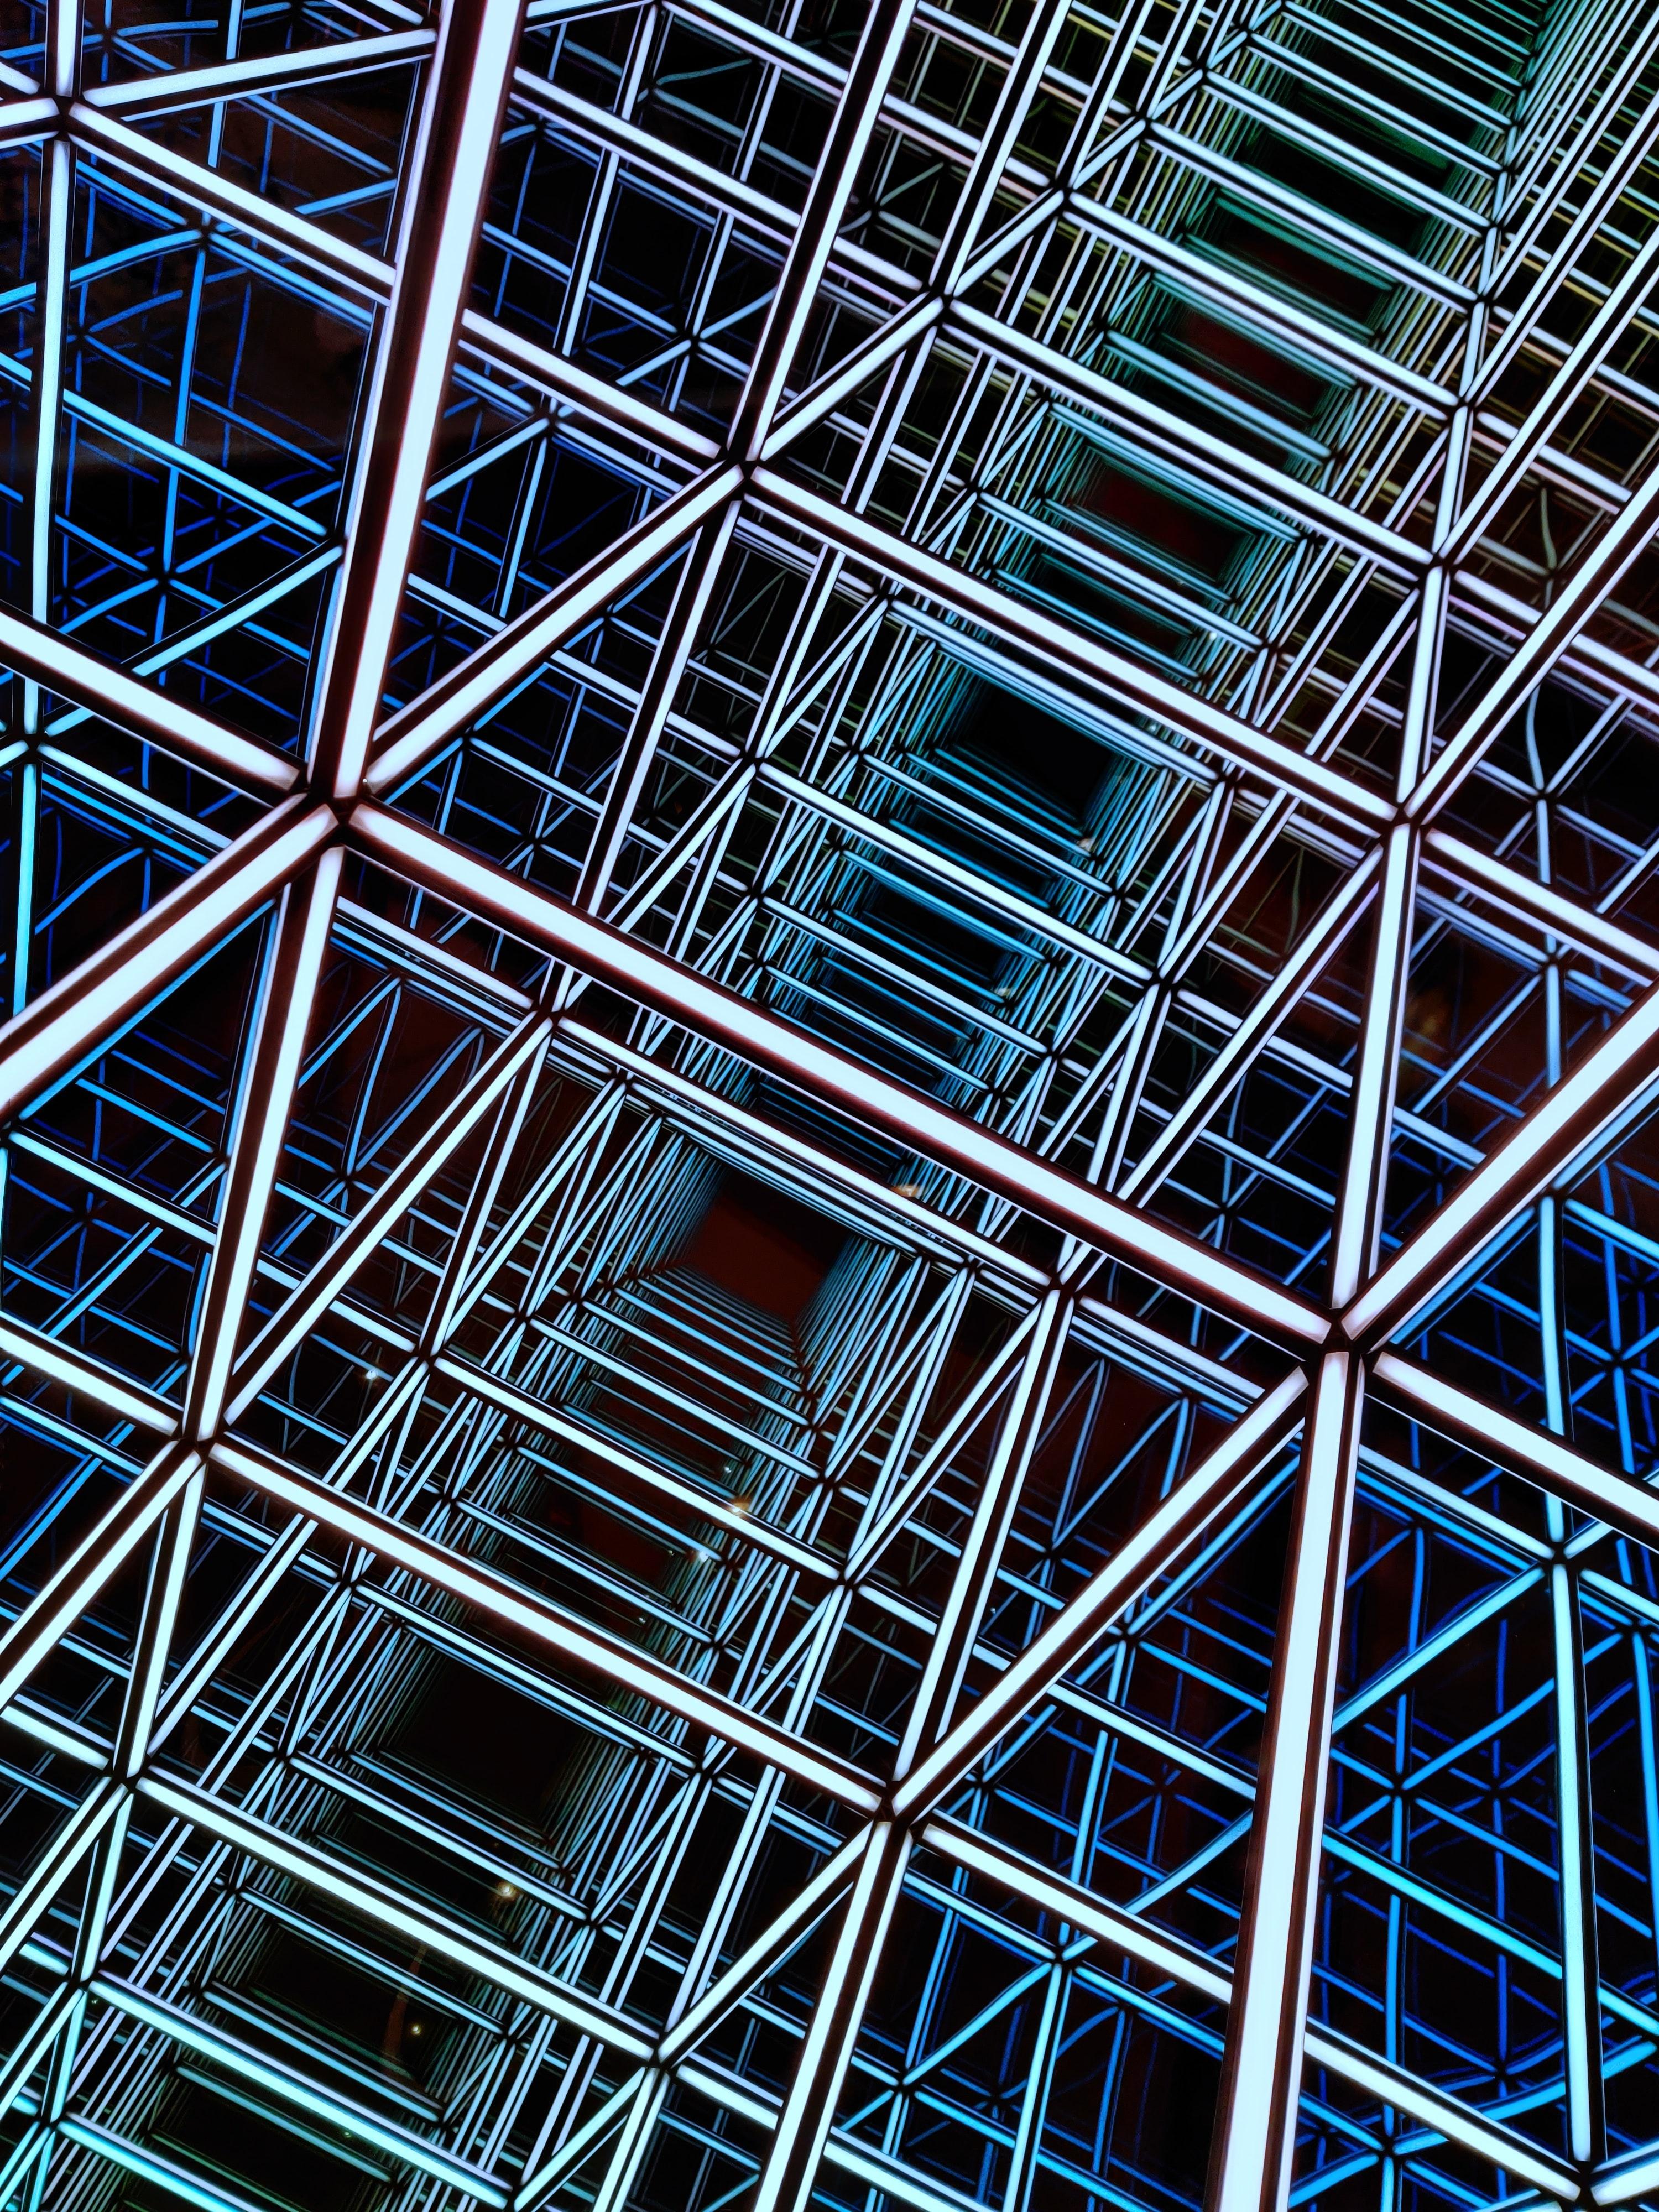 Dateninfrastruktur - das Rückgrat des digitalen Unternehmens